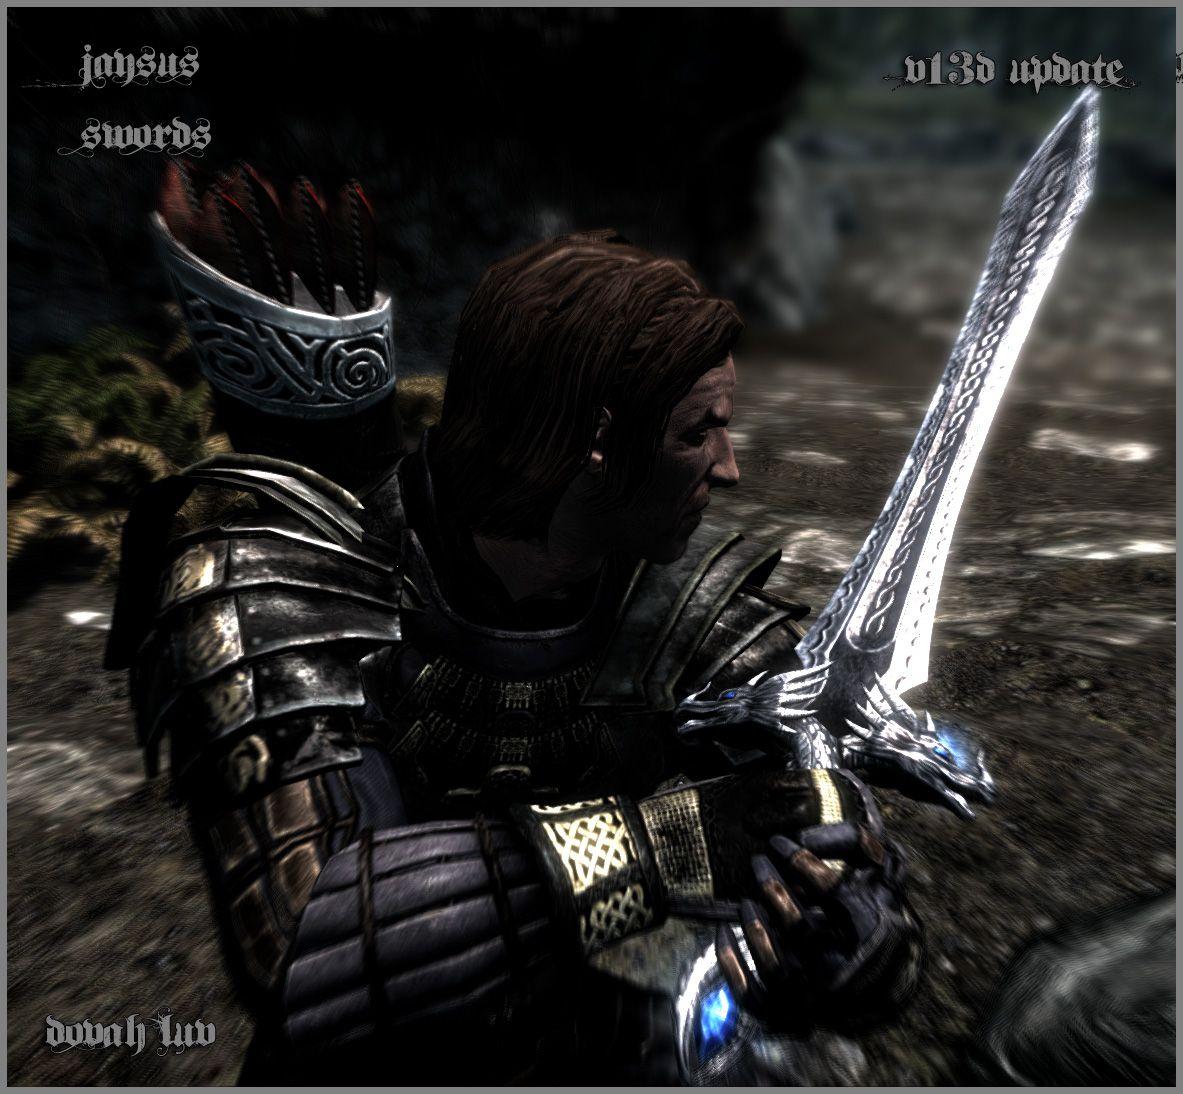 Jaysus Swords Skyrim Mod Skyrim Skyrim Nexus Mods Skyrim Mods